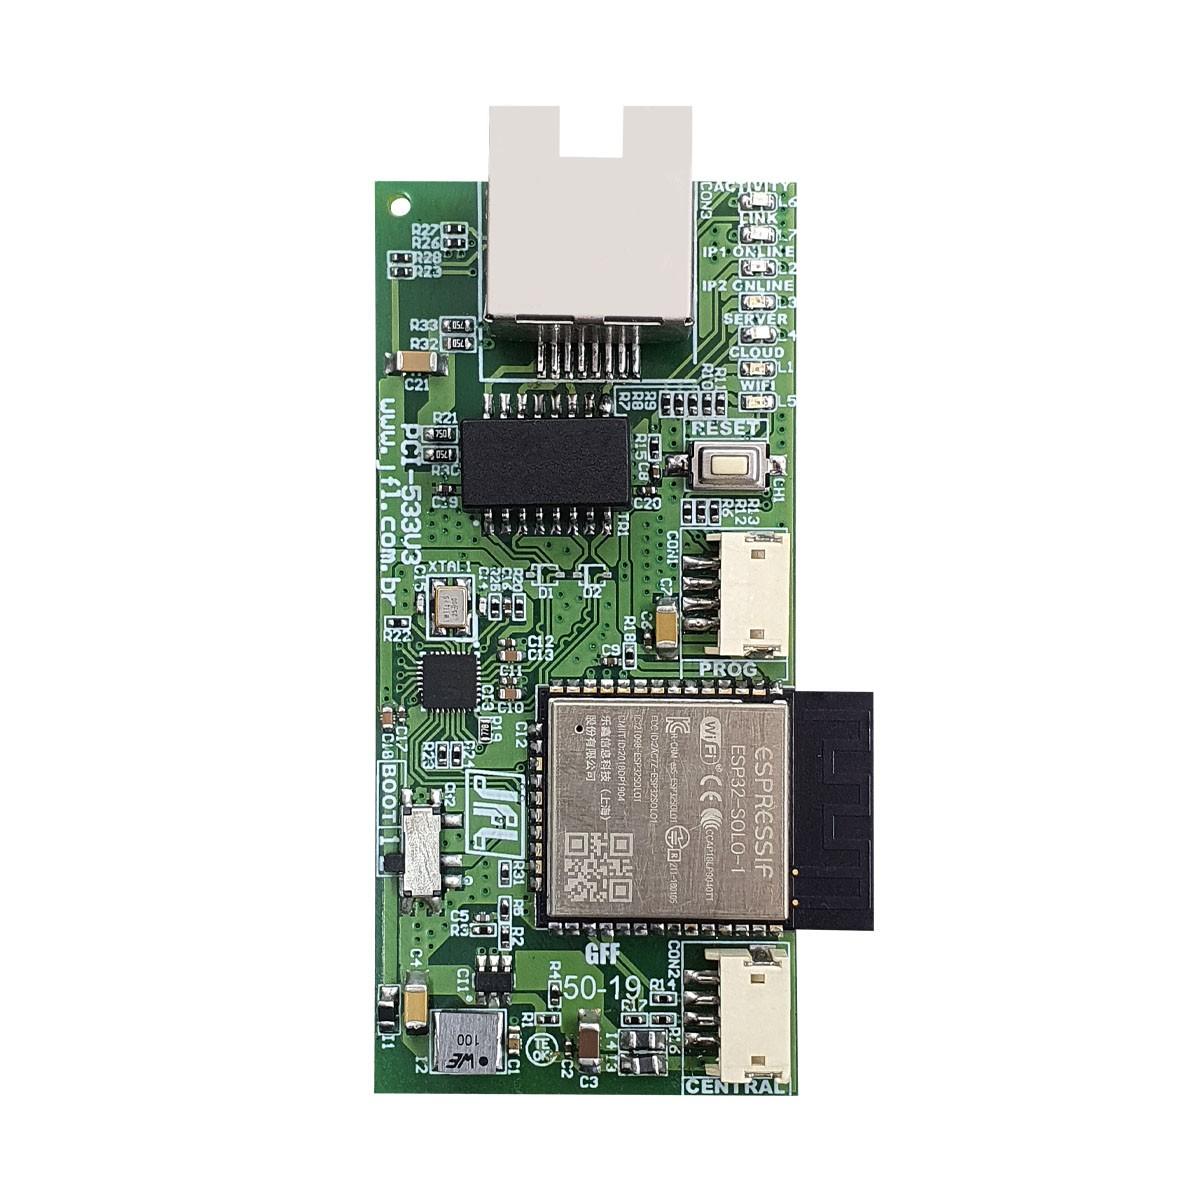 Kit Alarme Residencial Jfl SmartCloud 18 Sensores Idx 1001 e Shc Fit